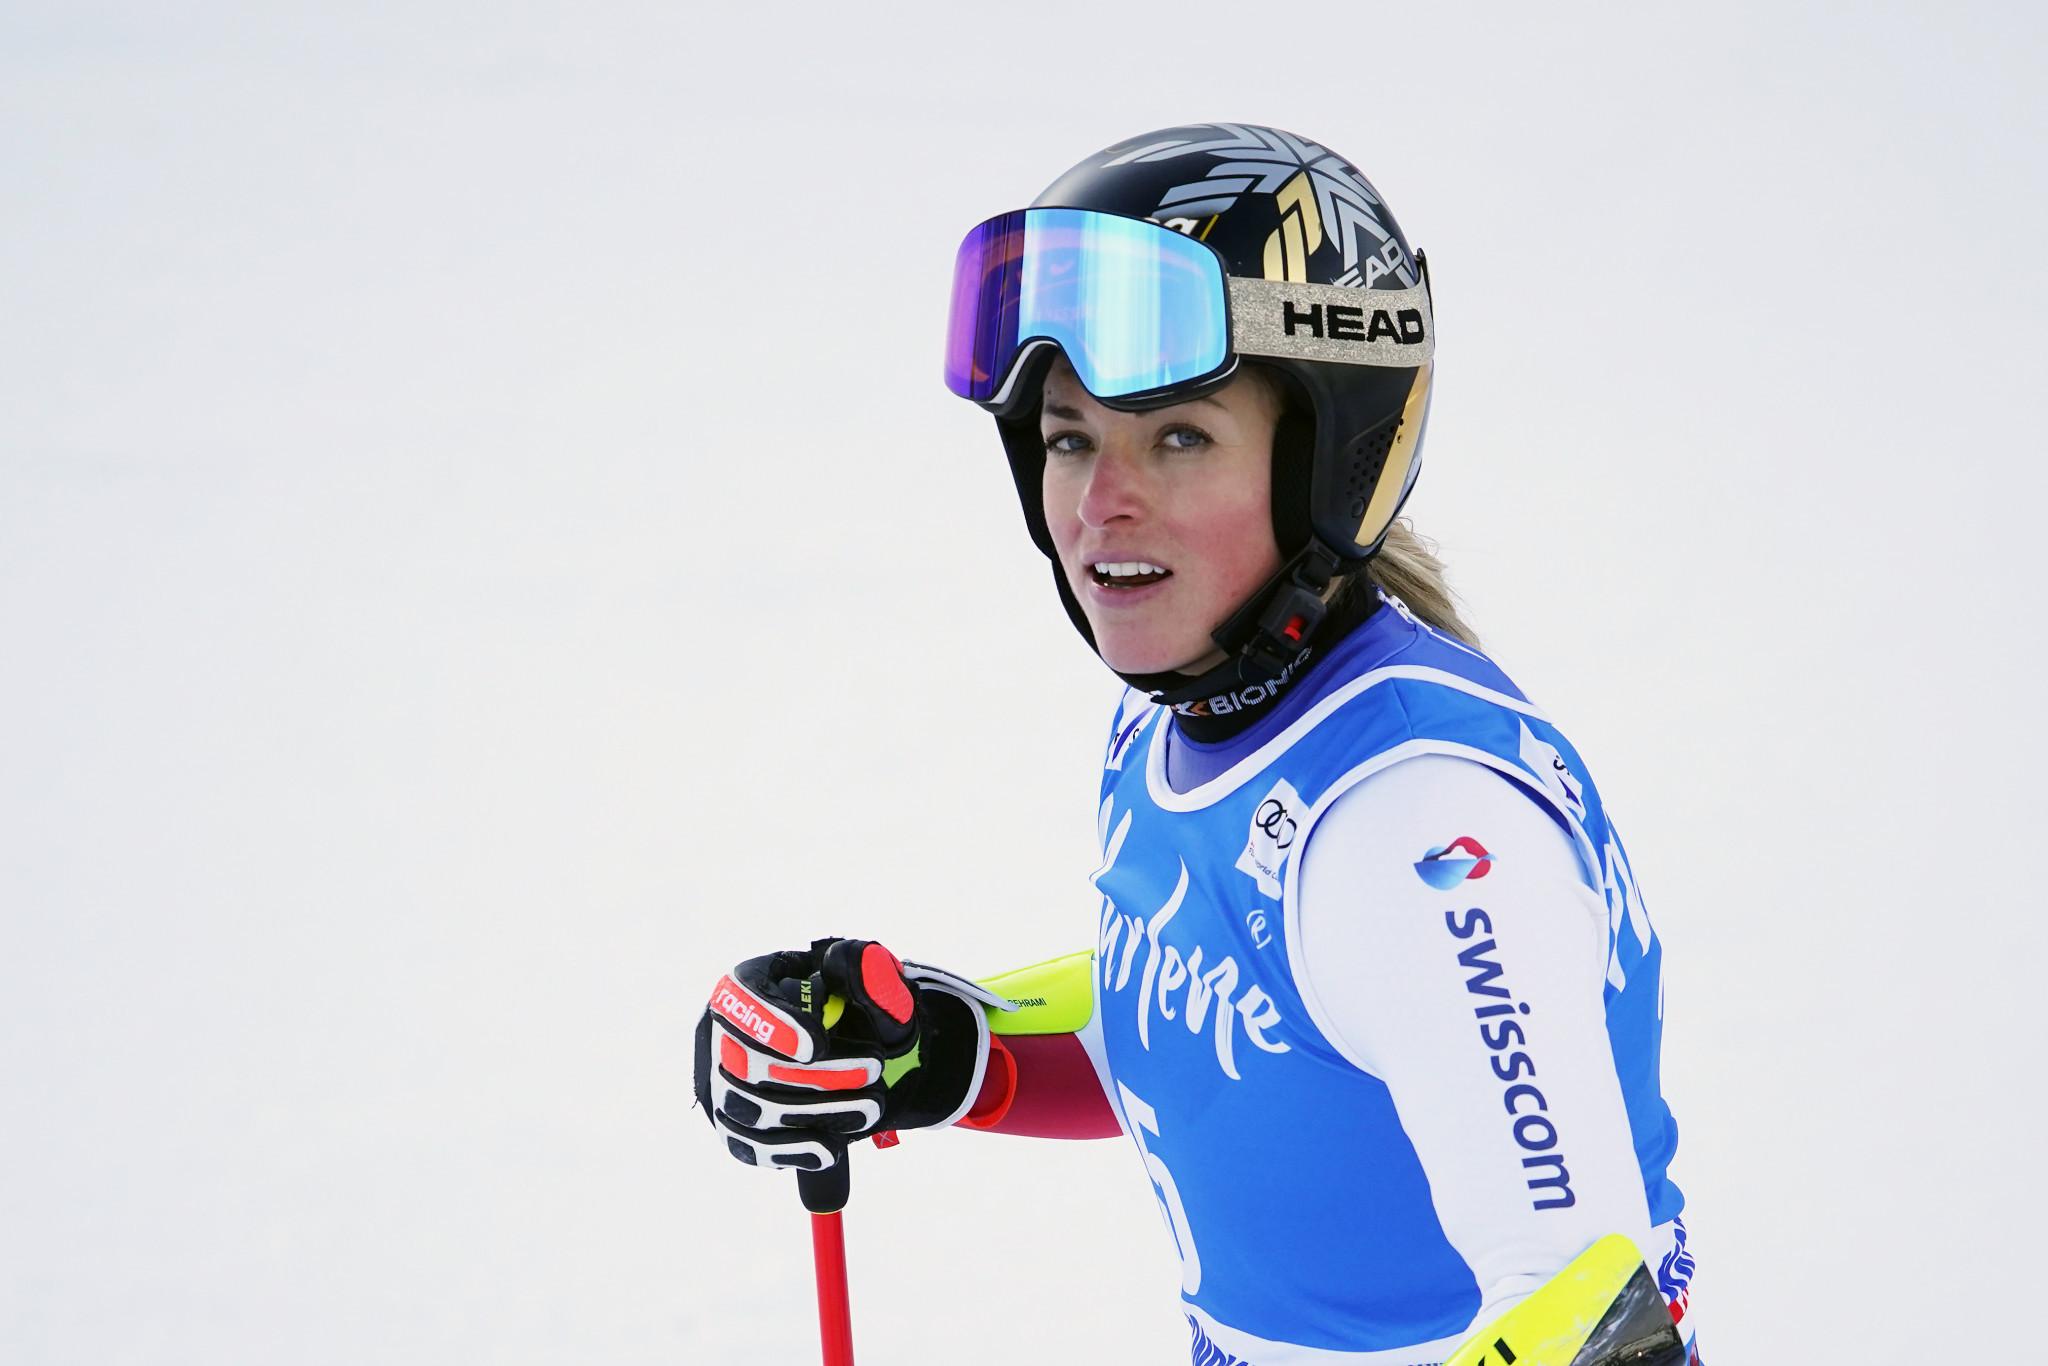 Swiss-Ski's main sponsor Swisscom to end 20-year sponsorship run